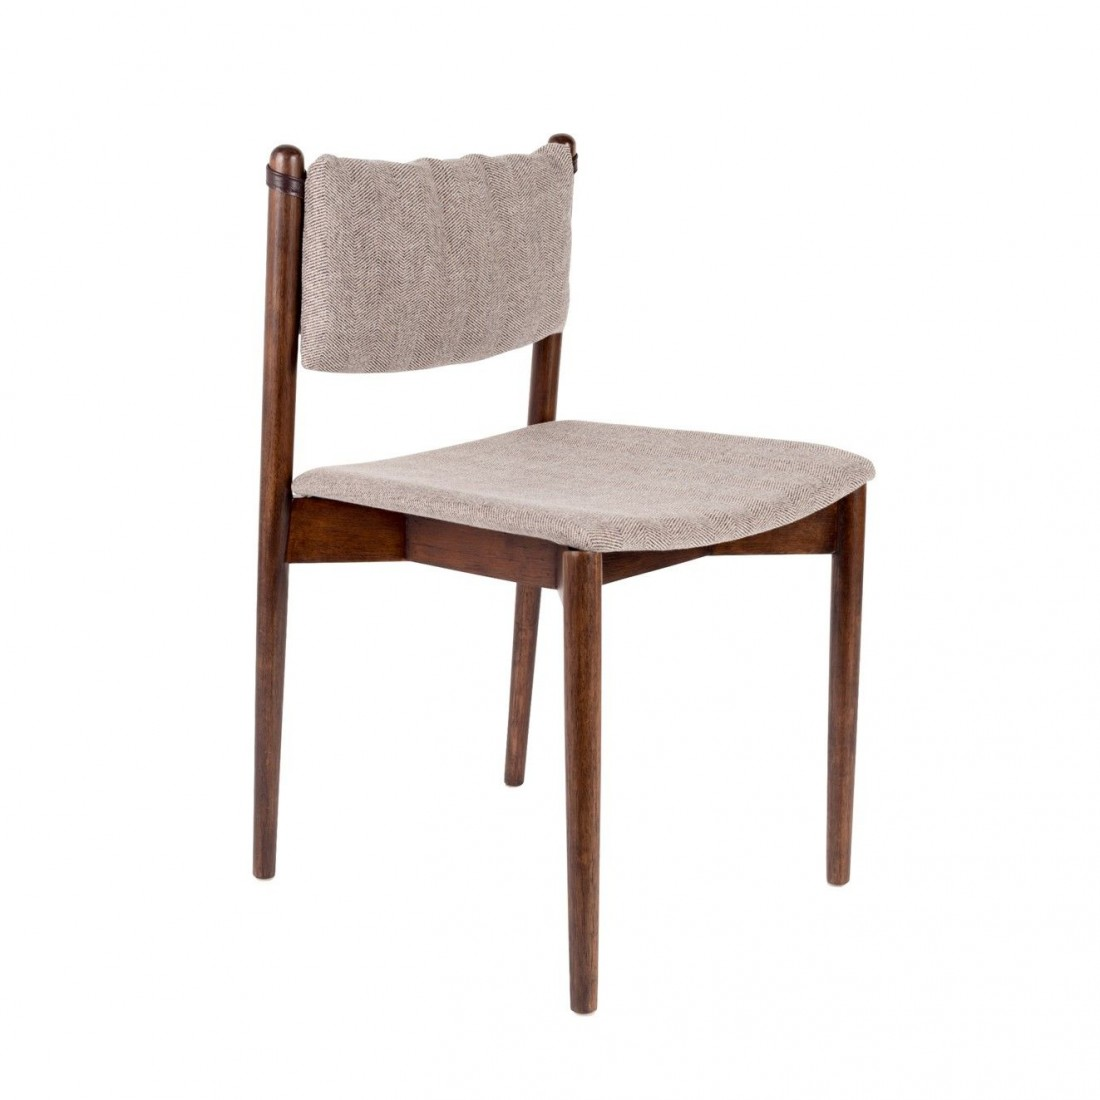 Chaise vintage Torrance - Dutchbone